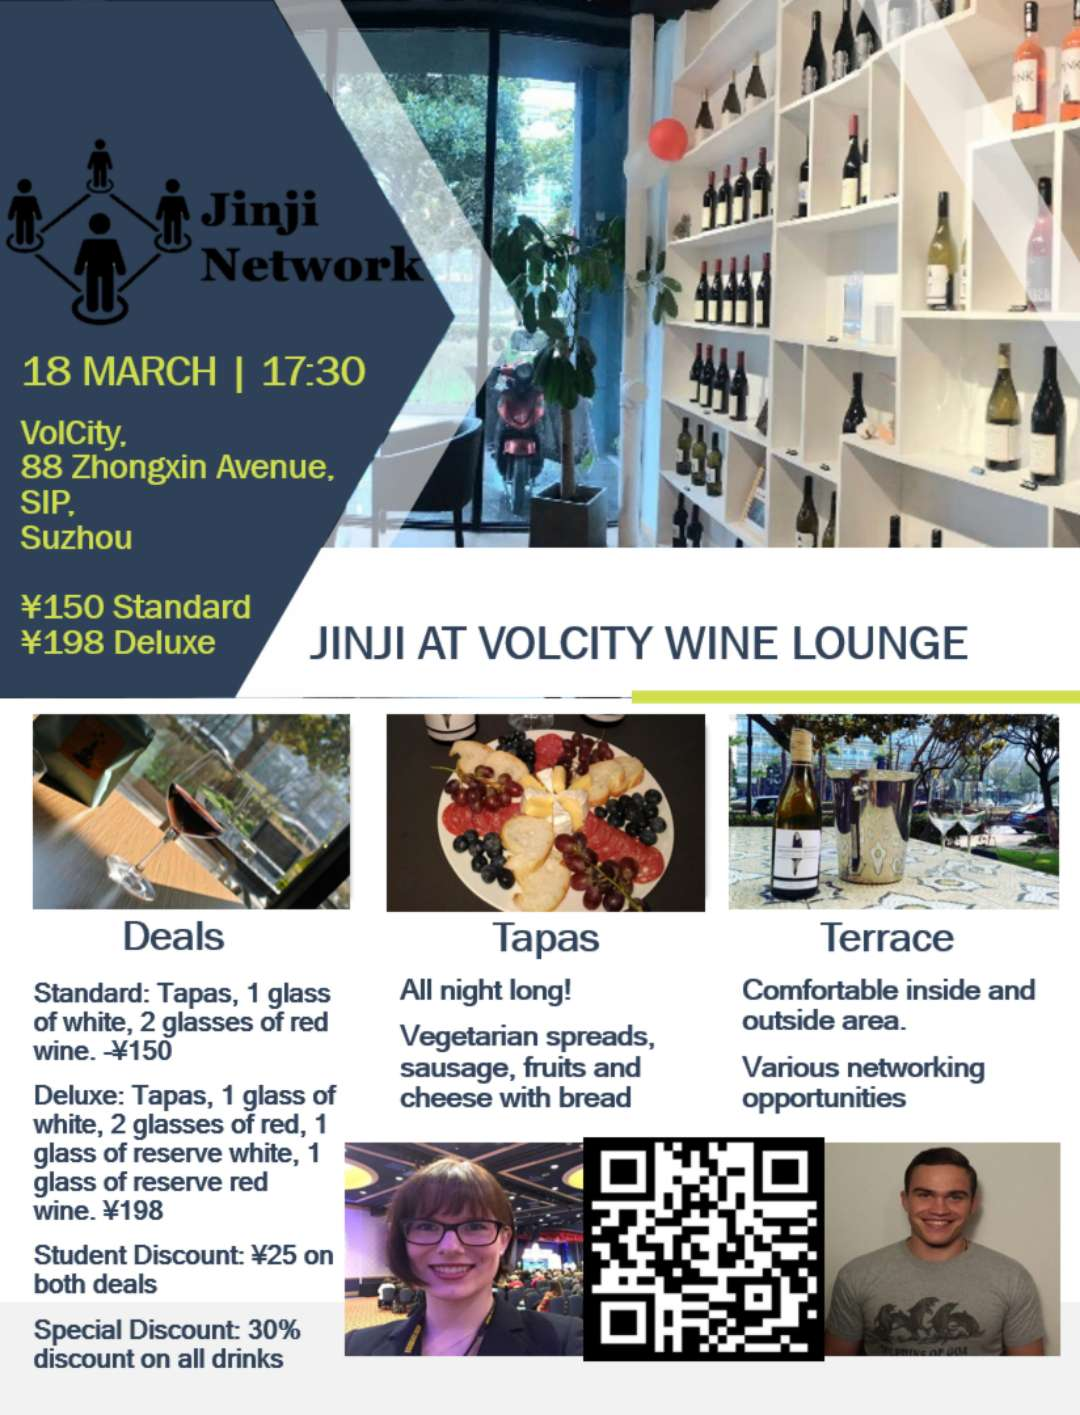 Jinji Network Wine Tasting